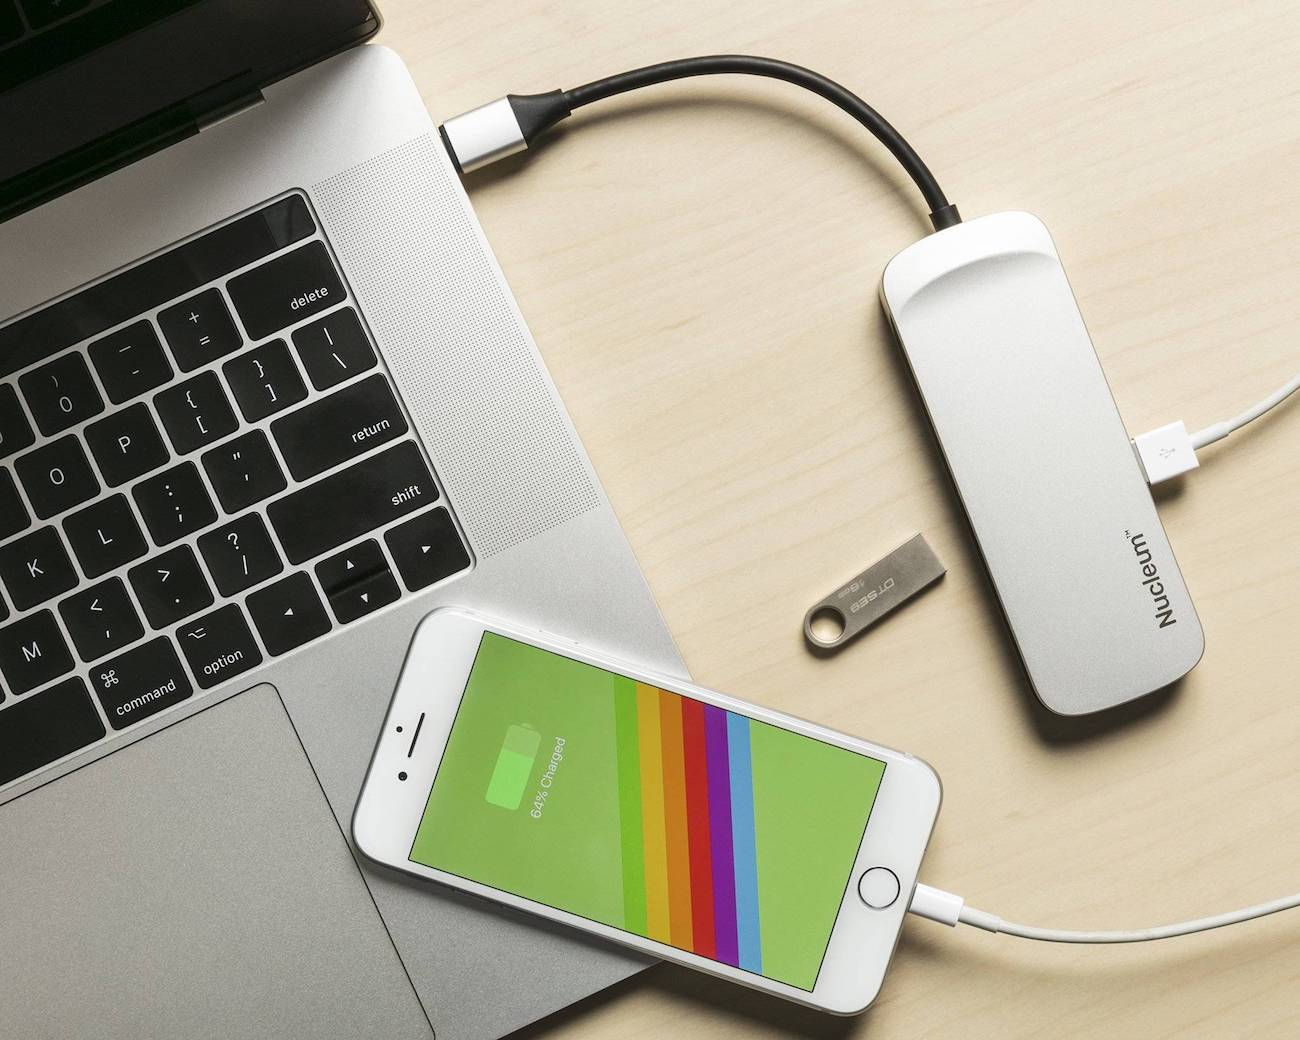 Kingston Nucleum USB Type-C Hub